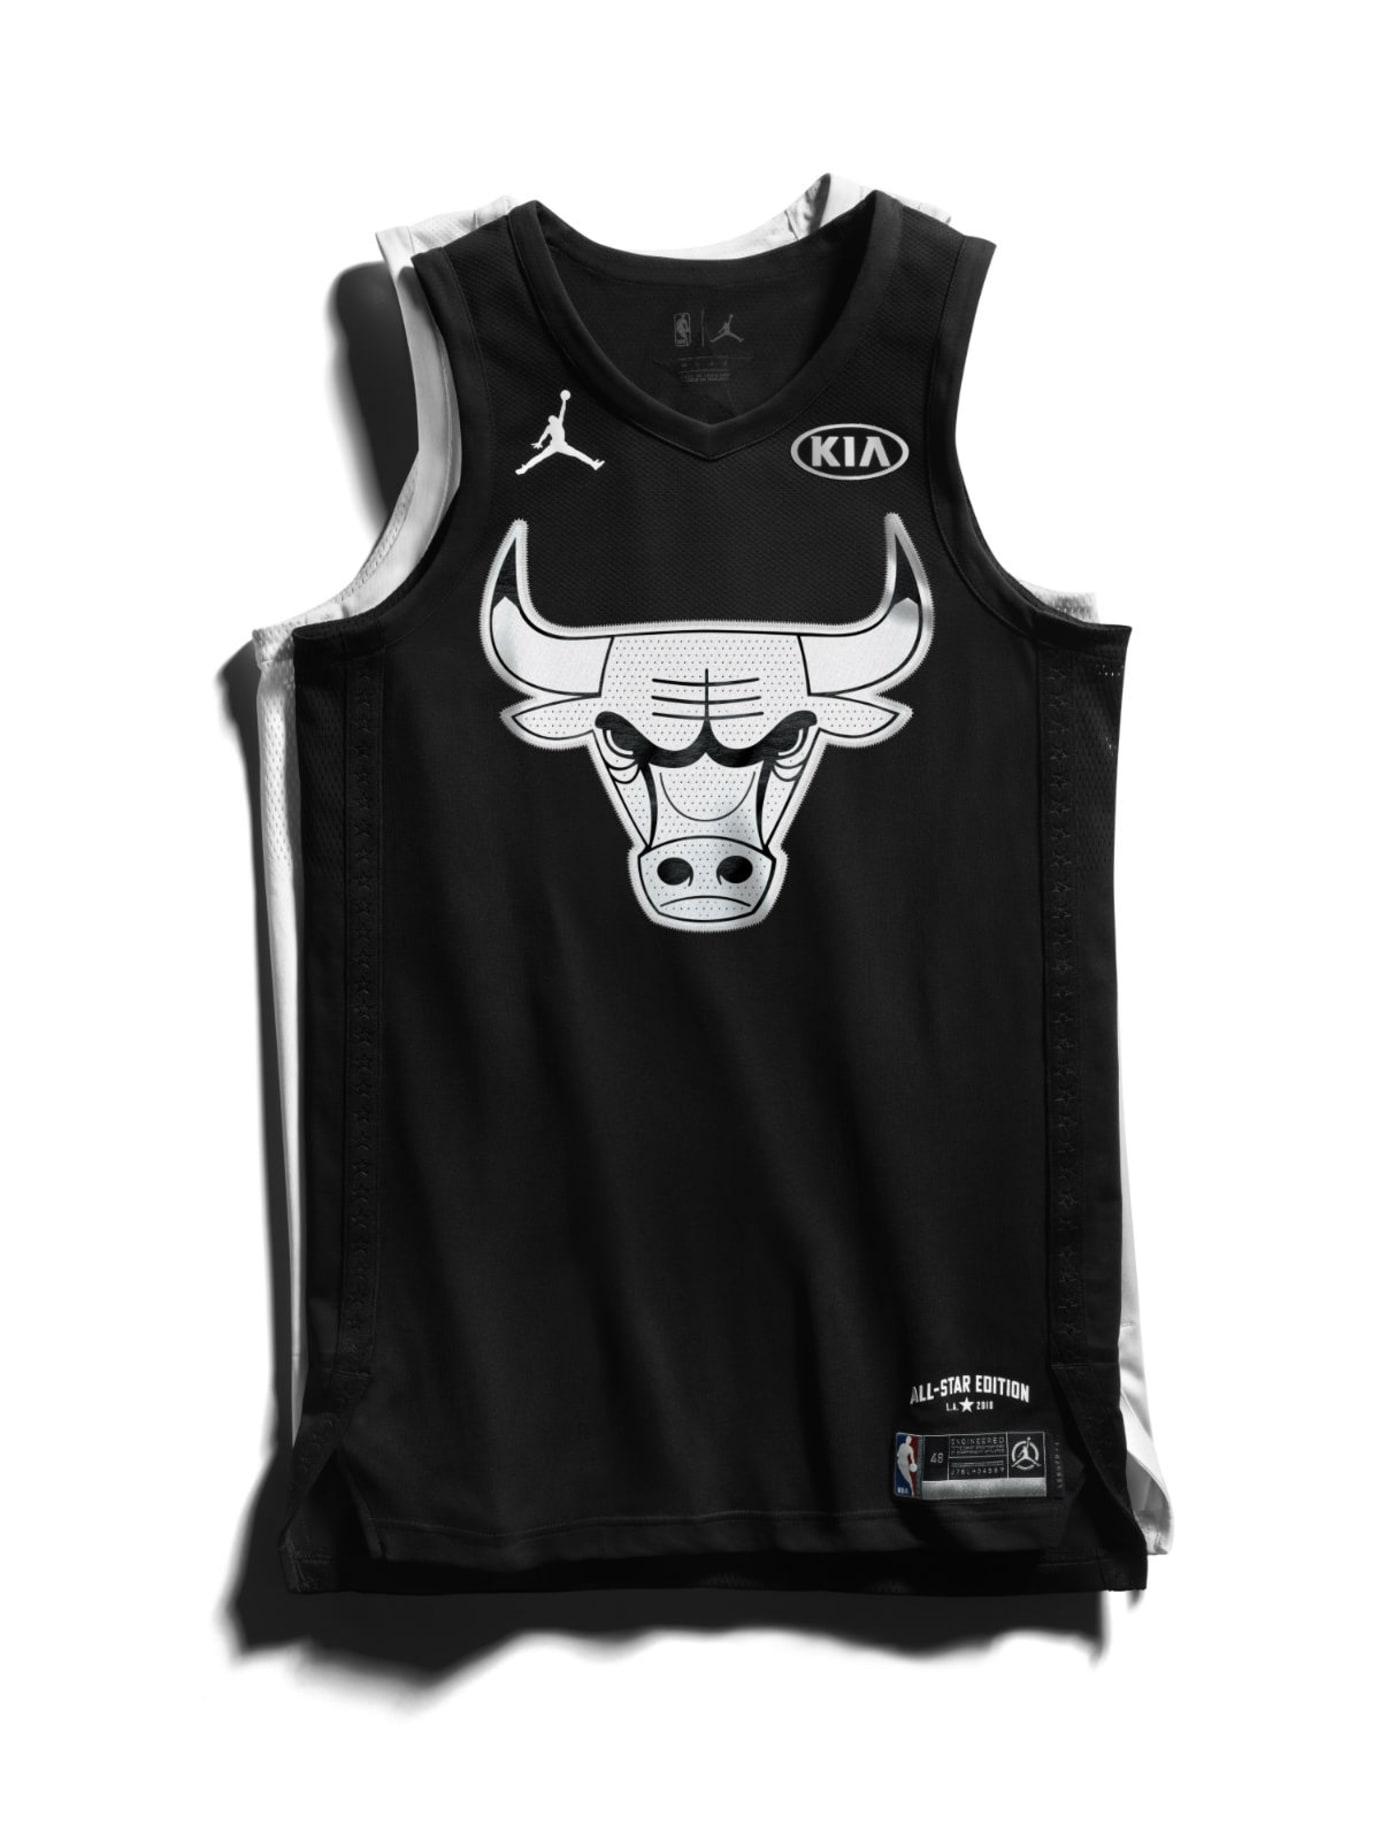 promo code 9472a 32087 Jordan Brand NBA All-Star Jerseys 2018 | Sole Collector